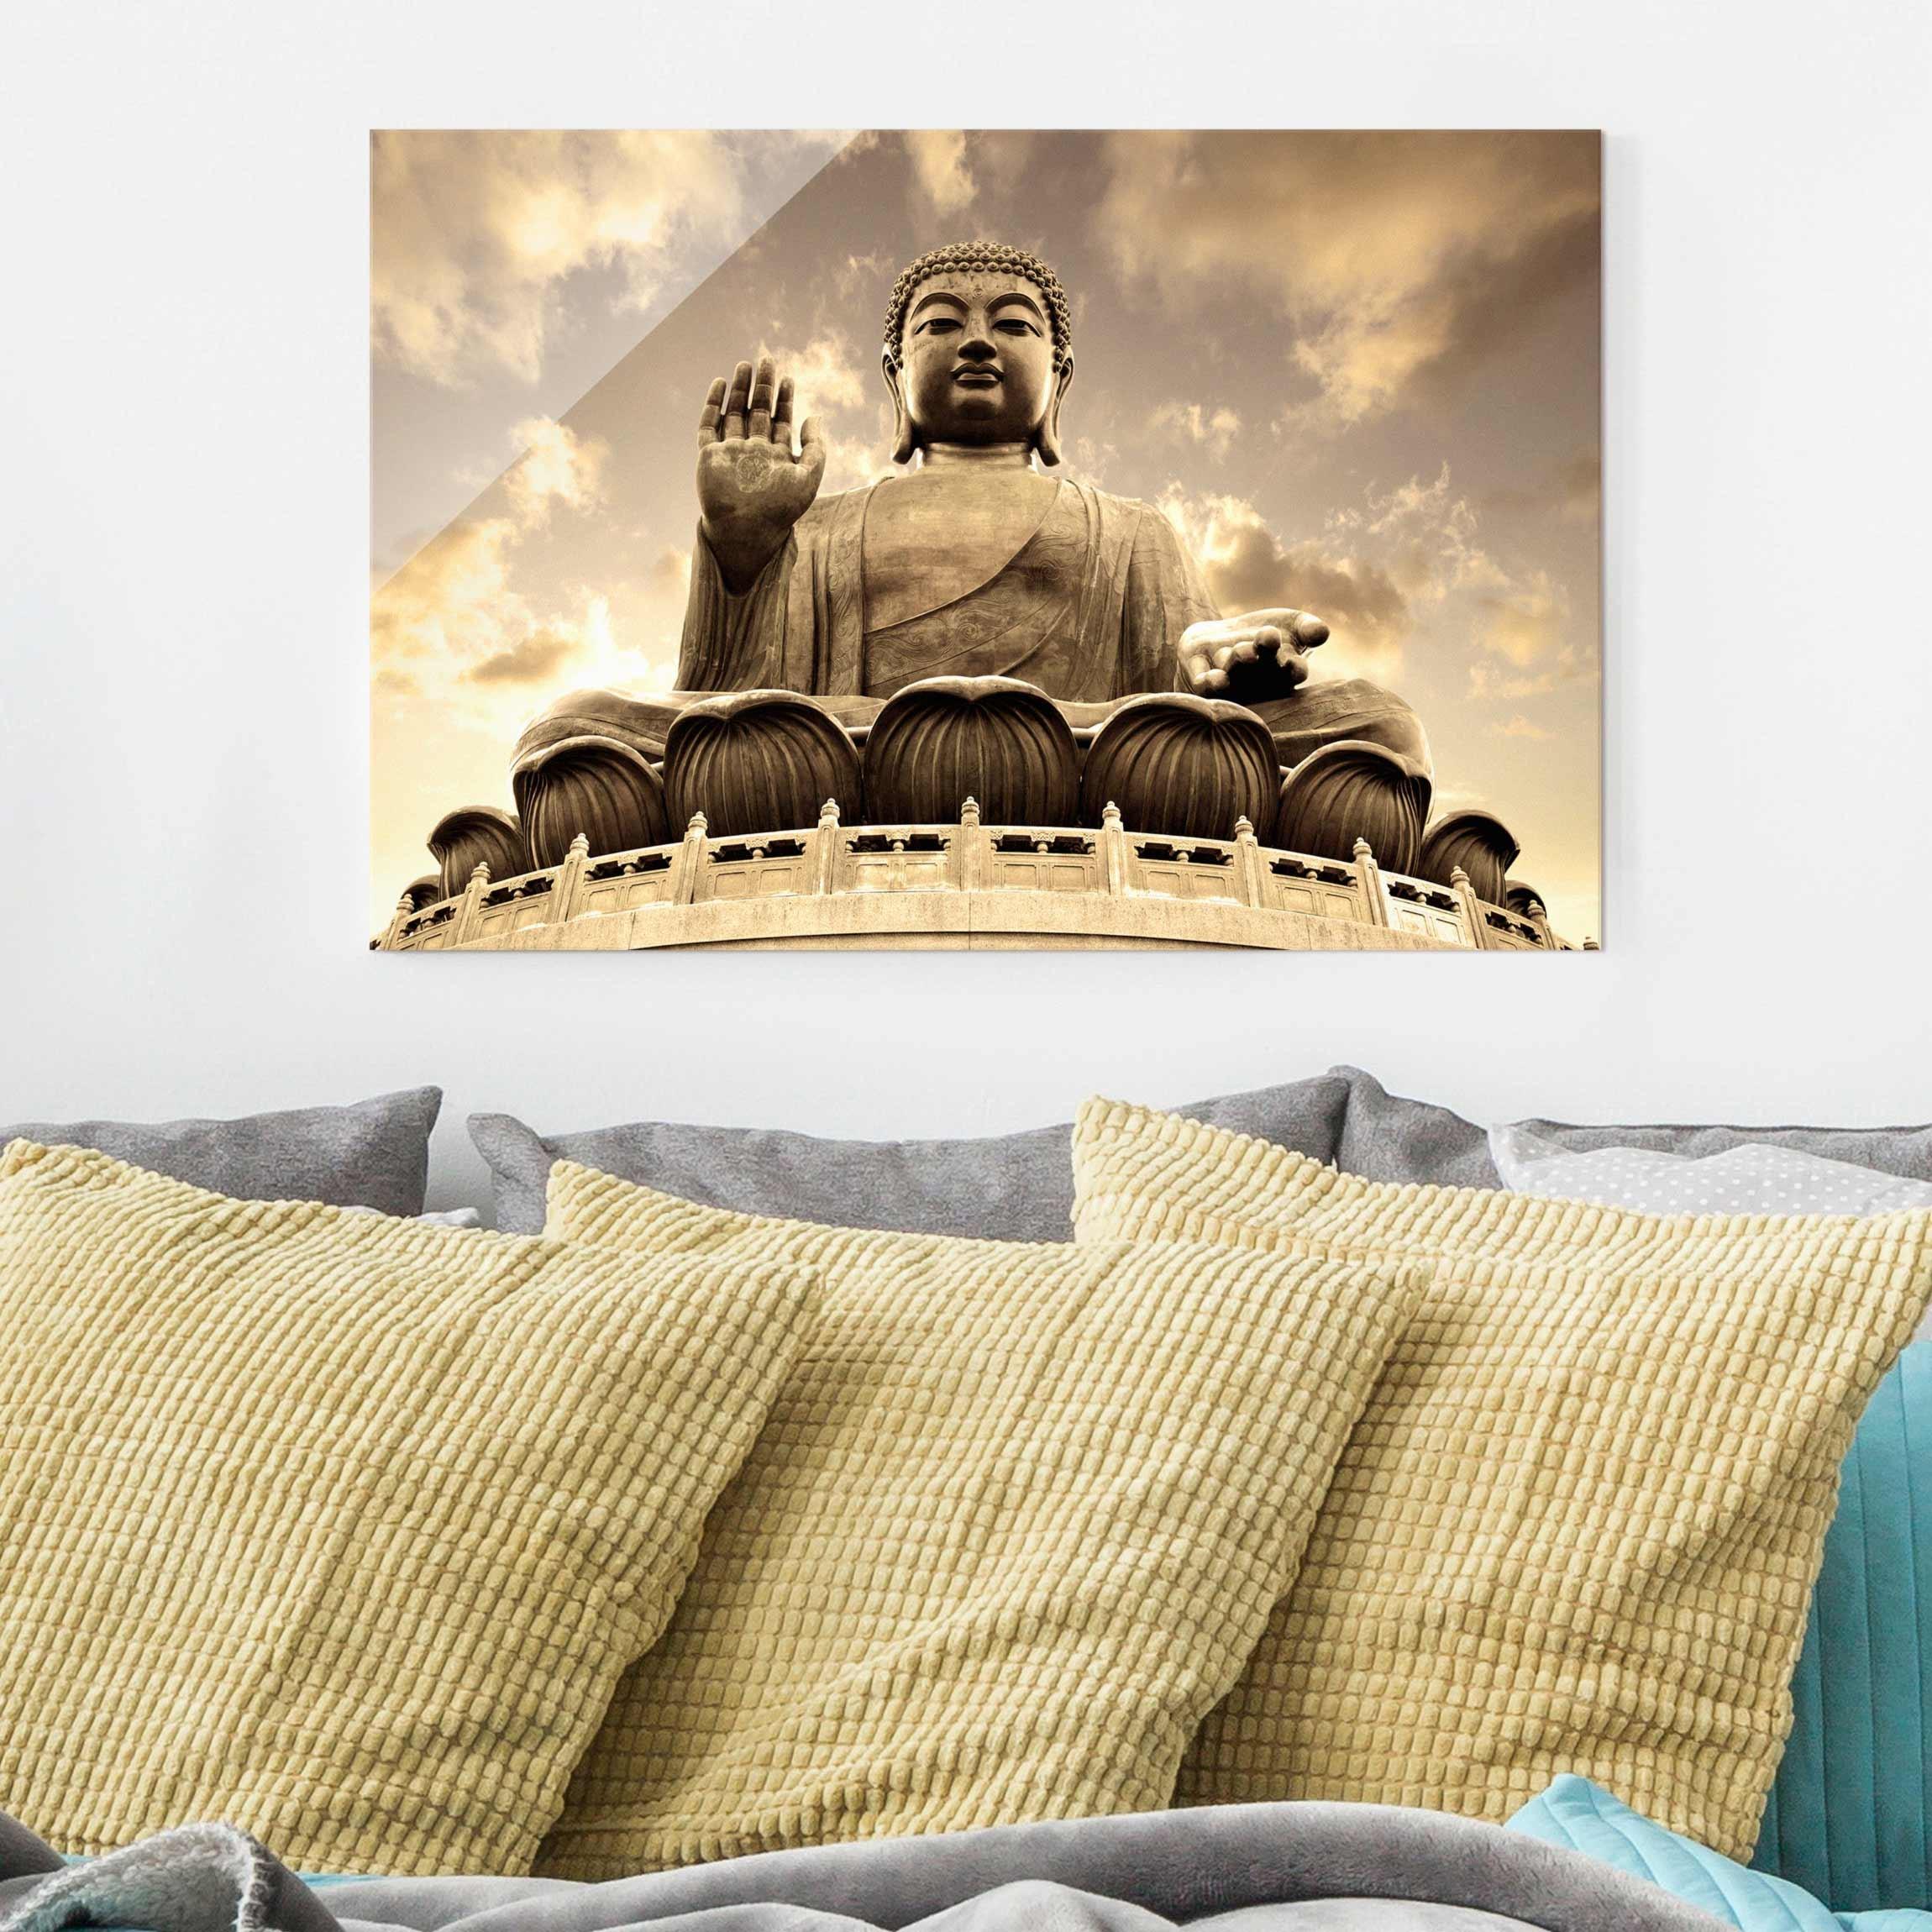 Glass Print - Big Buddha Sepia - Glass Wall Art Landscape Format 2:3